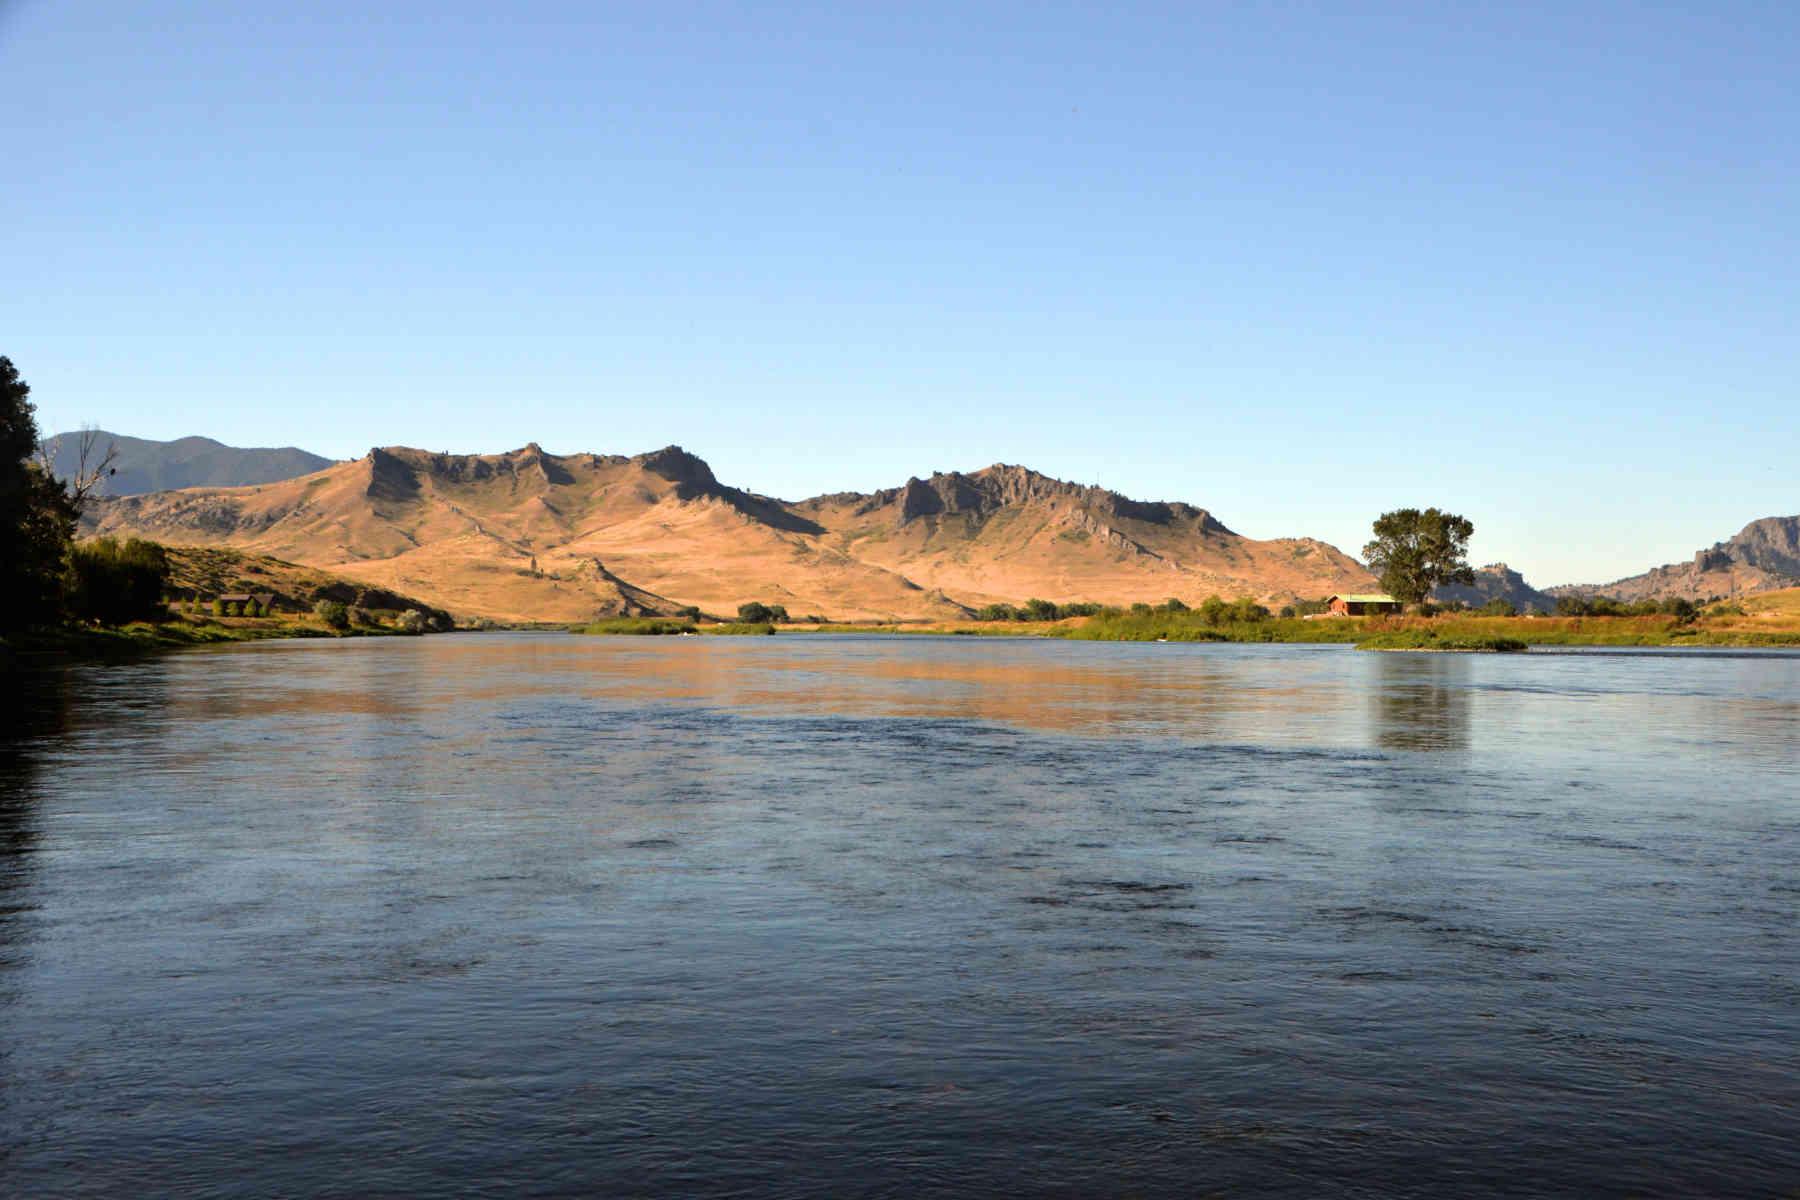 rocky-mountain-front-missouri-river